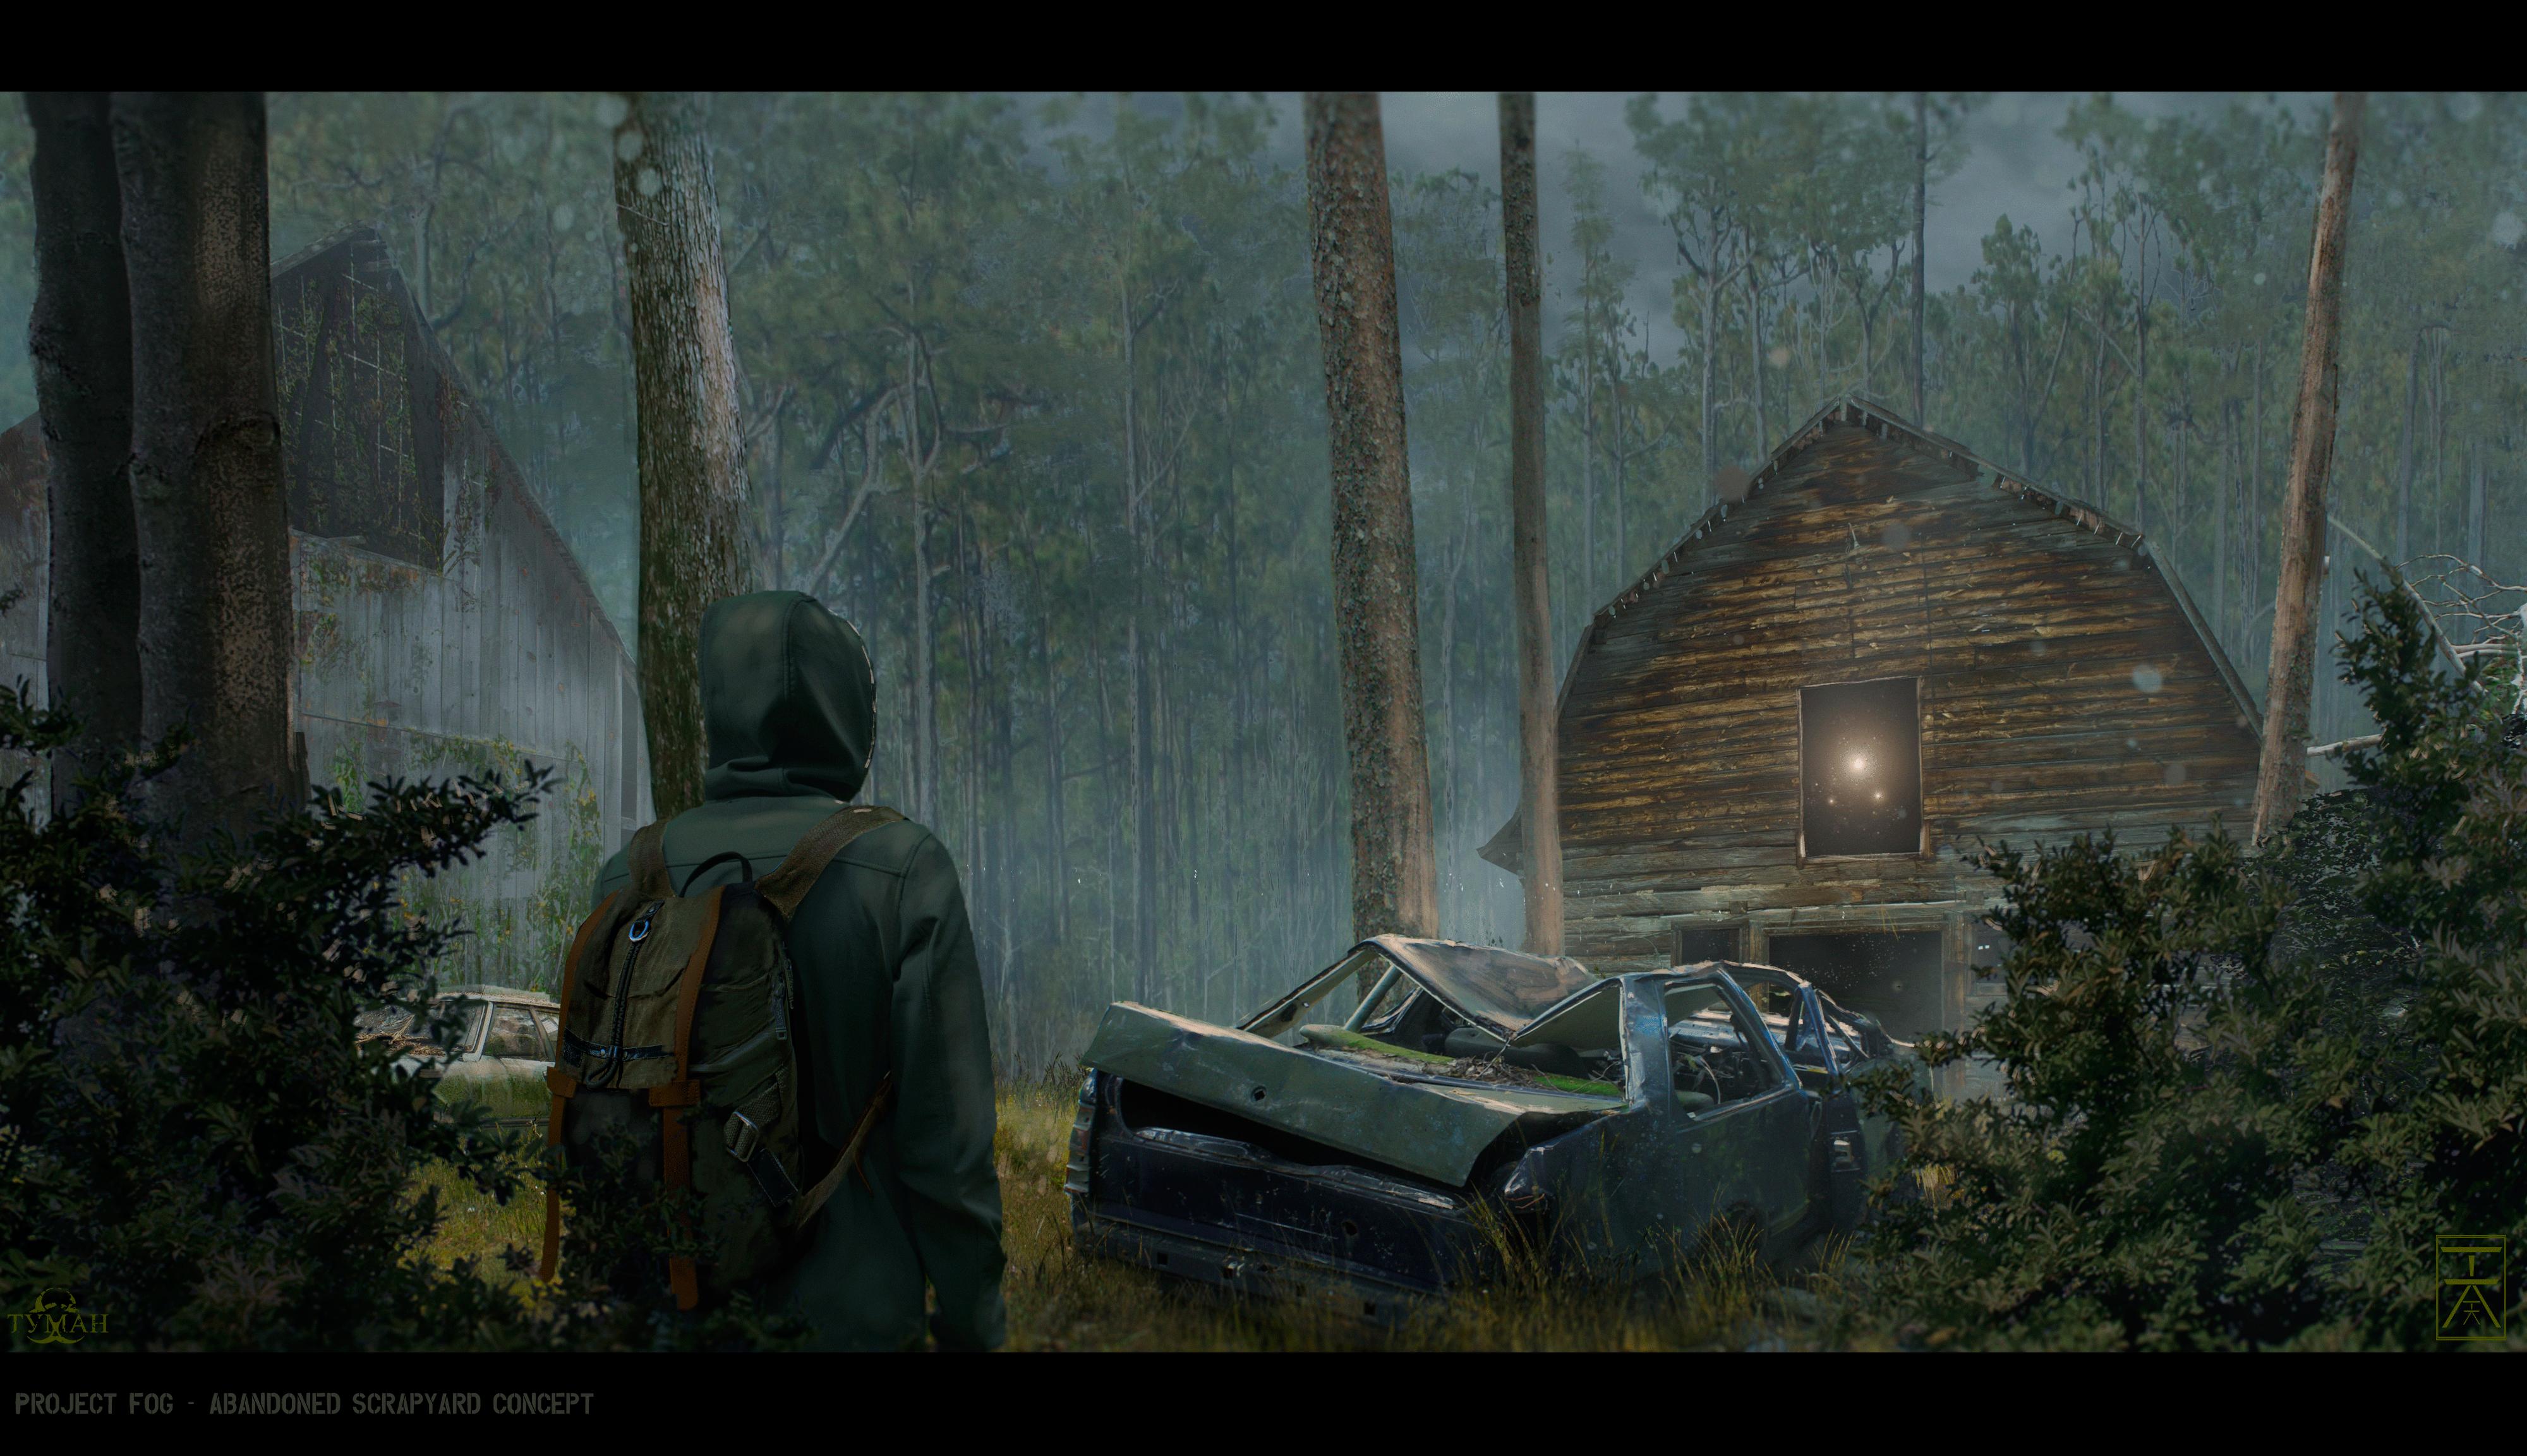 Project FOG - Abandoned Scrapyard by AranniHK